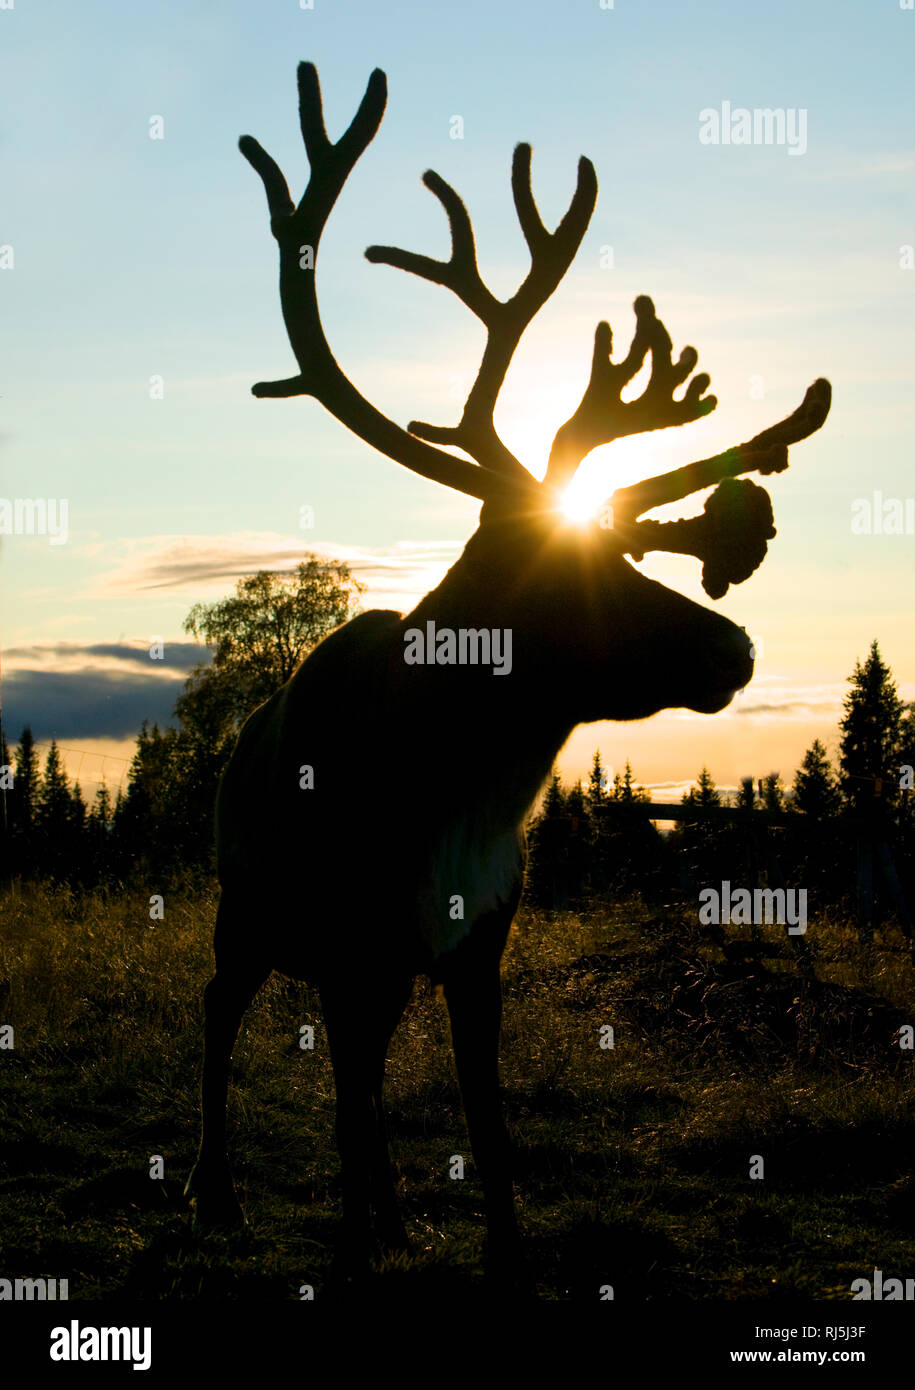 Reindeer at night Stock Photo